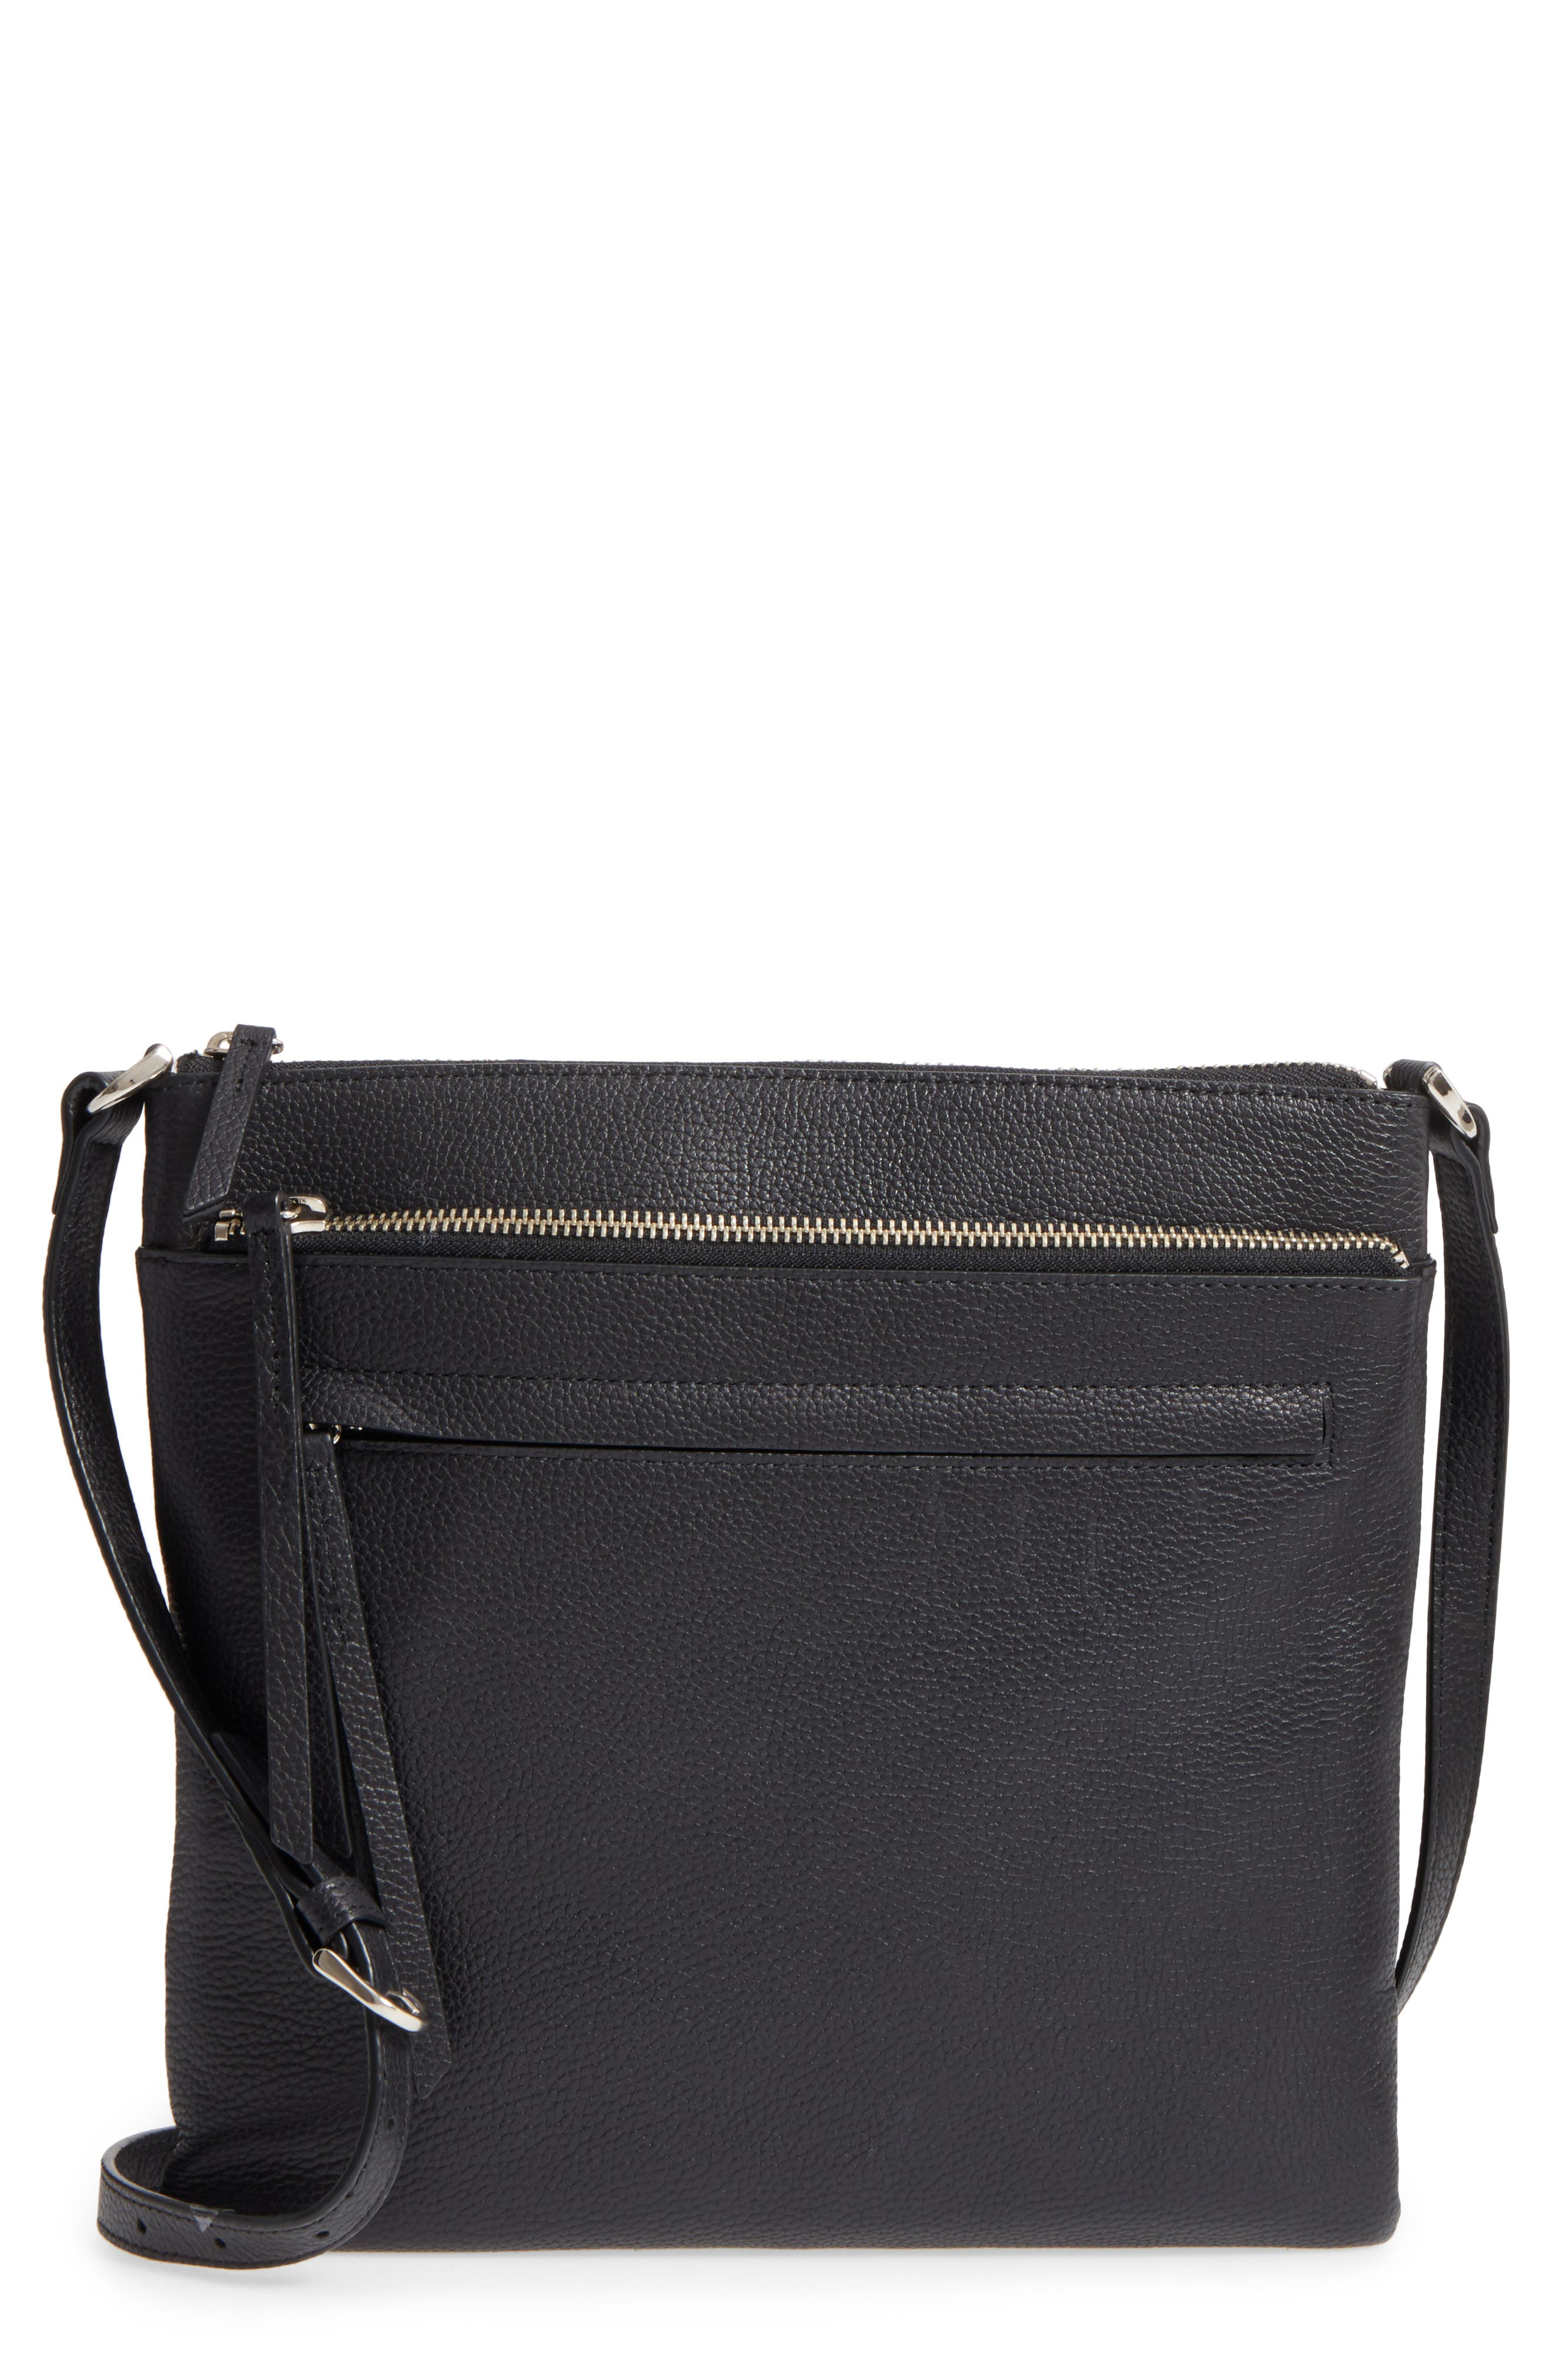 Finn Leather Crossbody Bag,                             Main thumbnail 1, color,                             BLACK